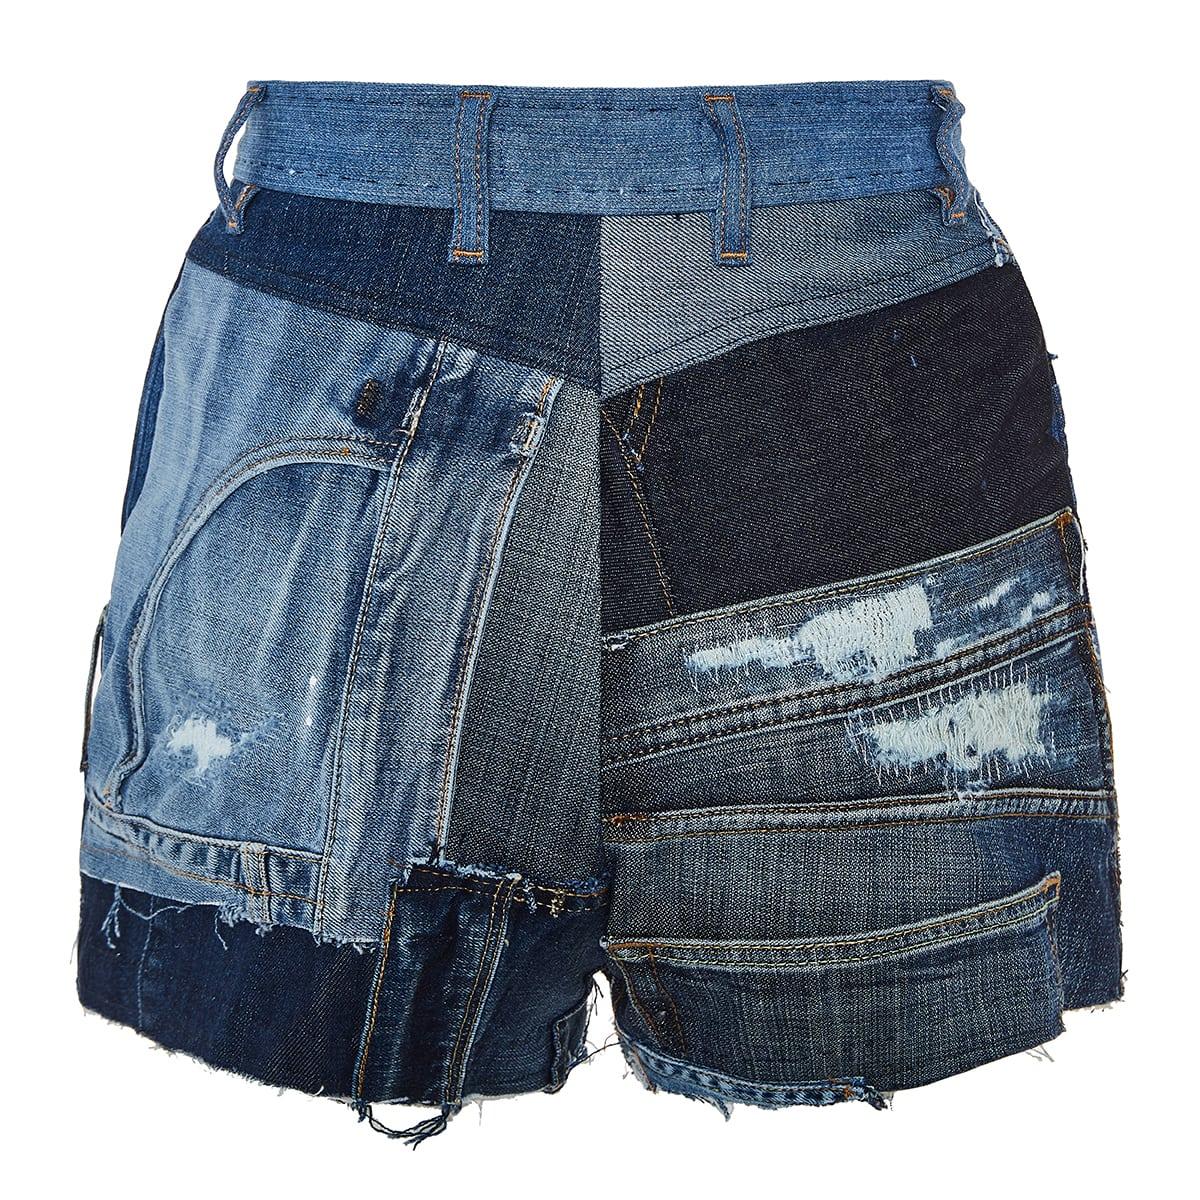 Patchwork denim mini shorts